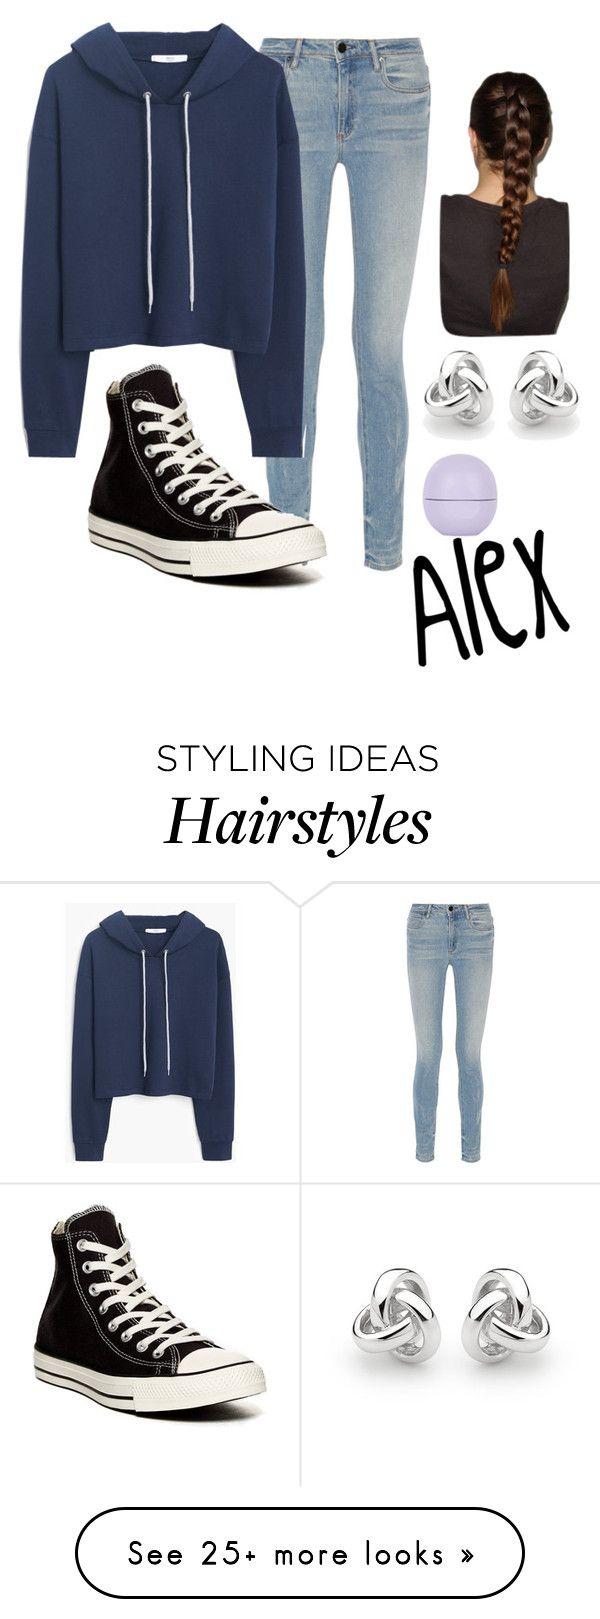 """Alex-A"" by fandom-fashion7 on Polyvore featuring Alexander Wang, MANGO, Converse, Topshop and Georgini"